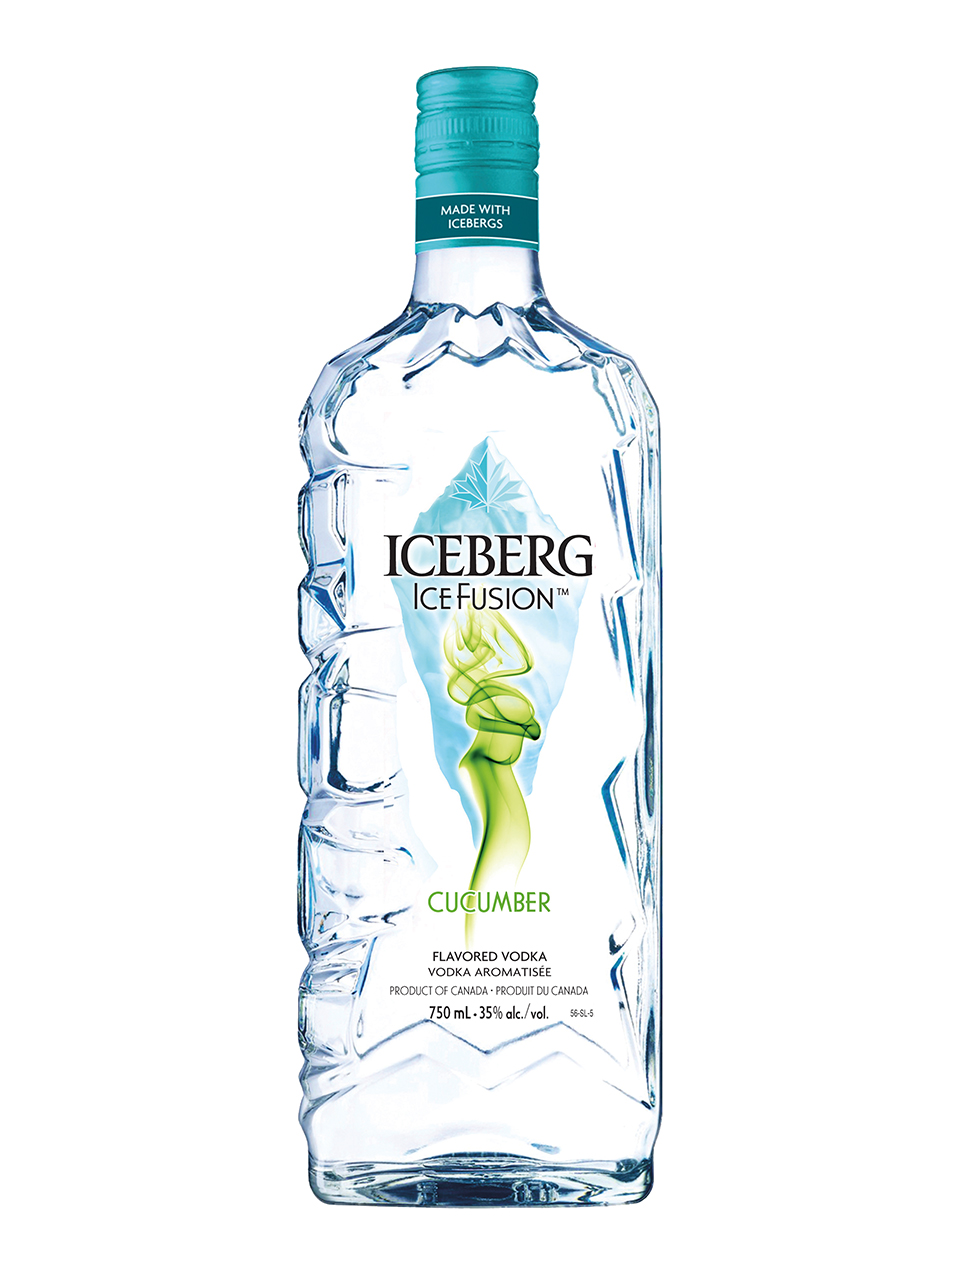 Iceberg Ice Fusion Cucumber